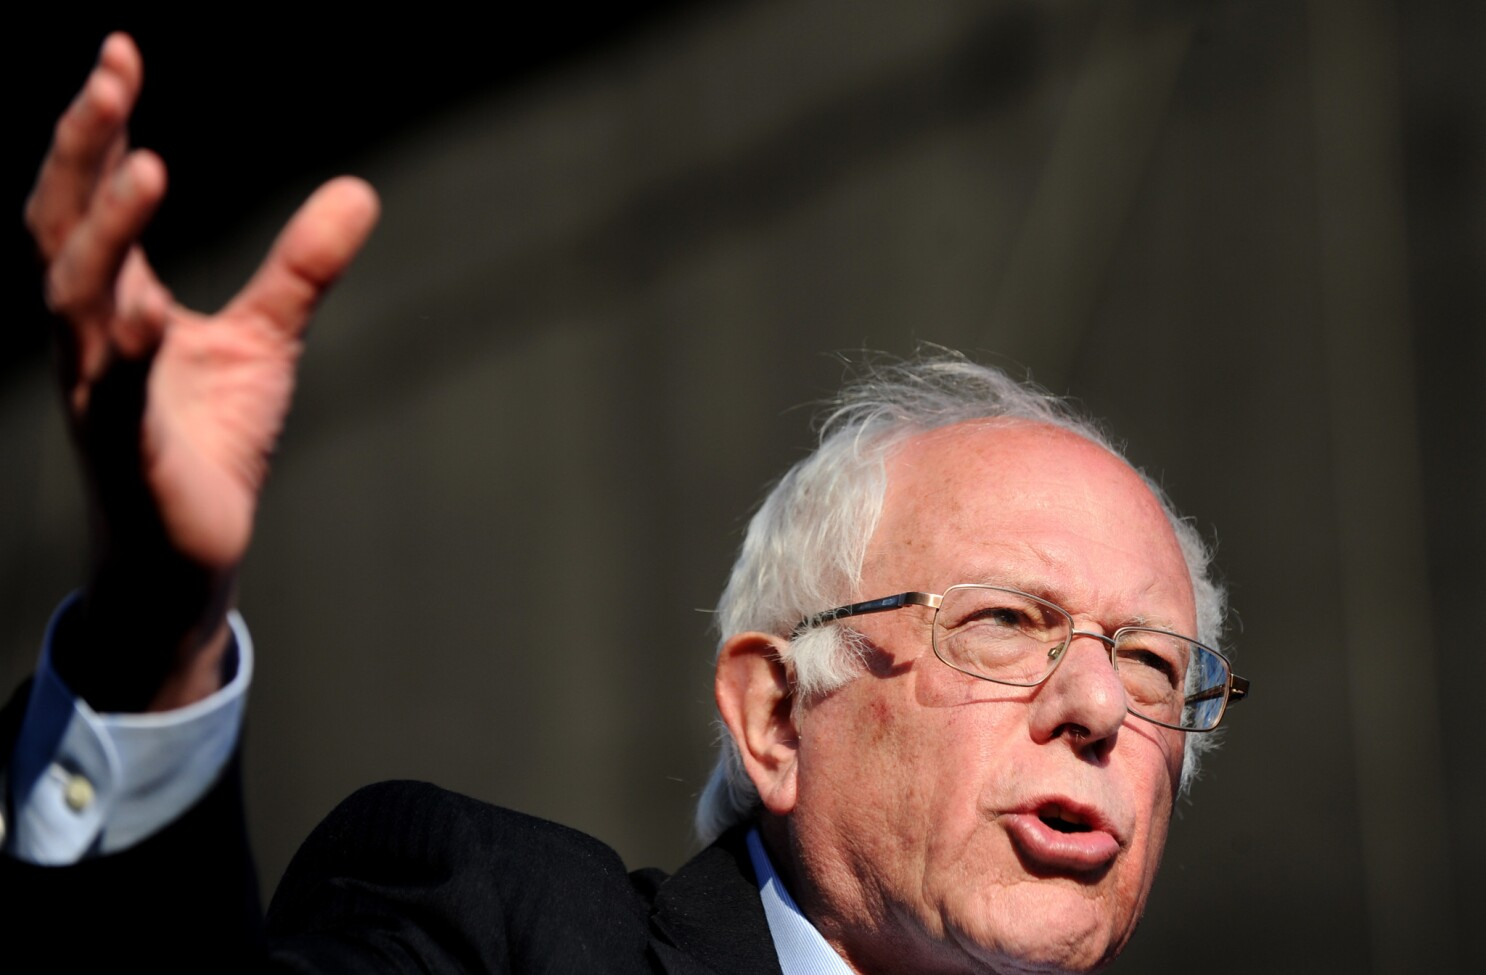 Bernie Sanders calls for $16 trillion in spending against climate change